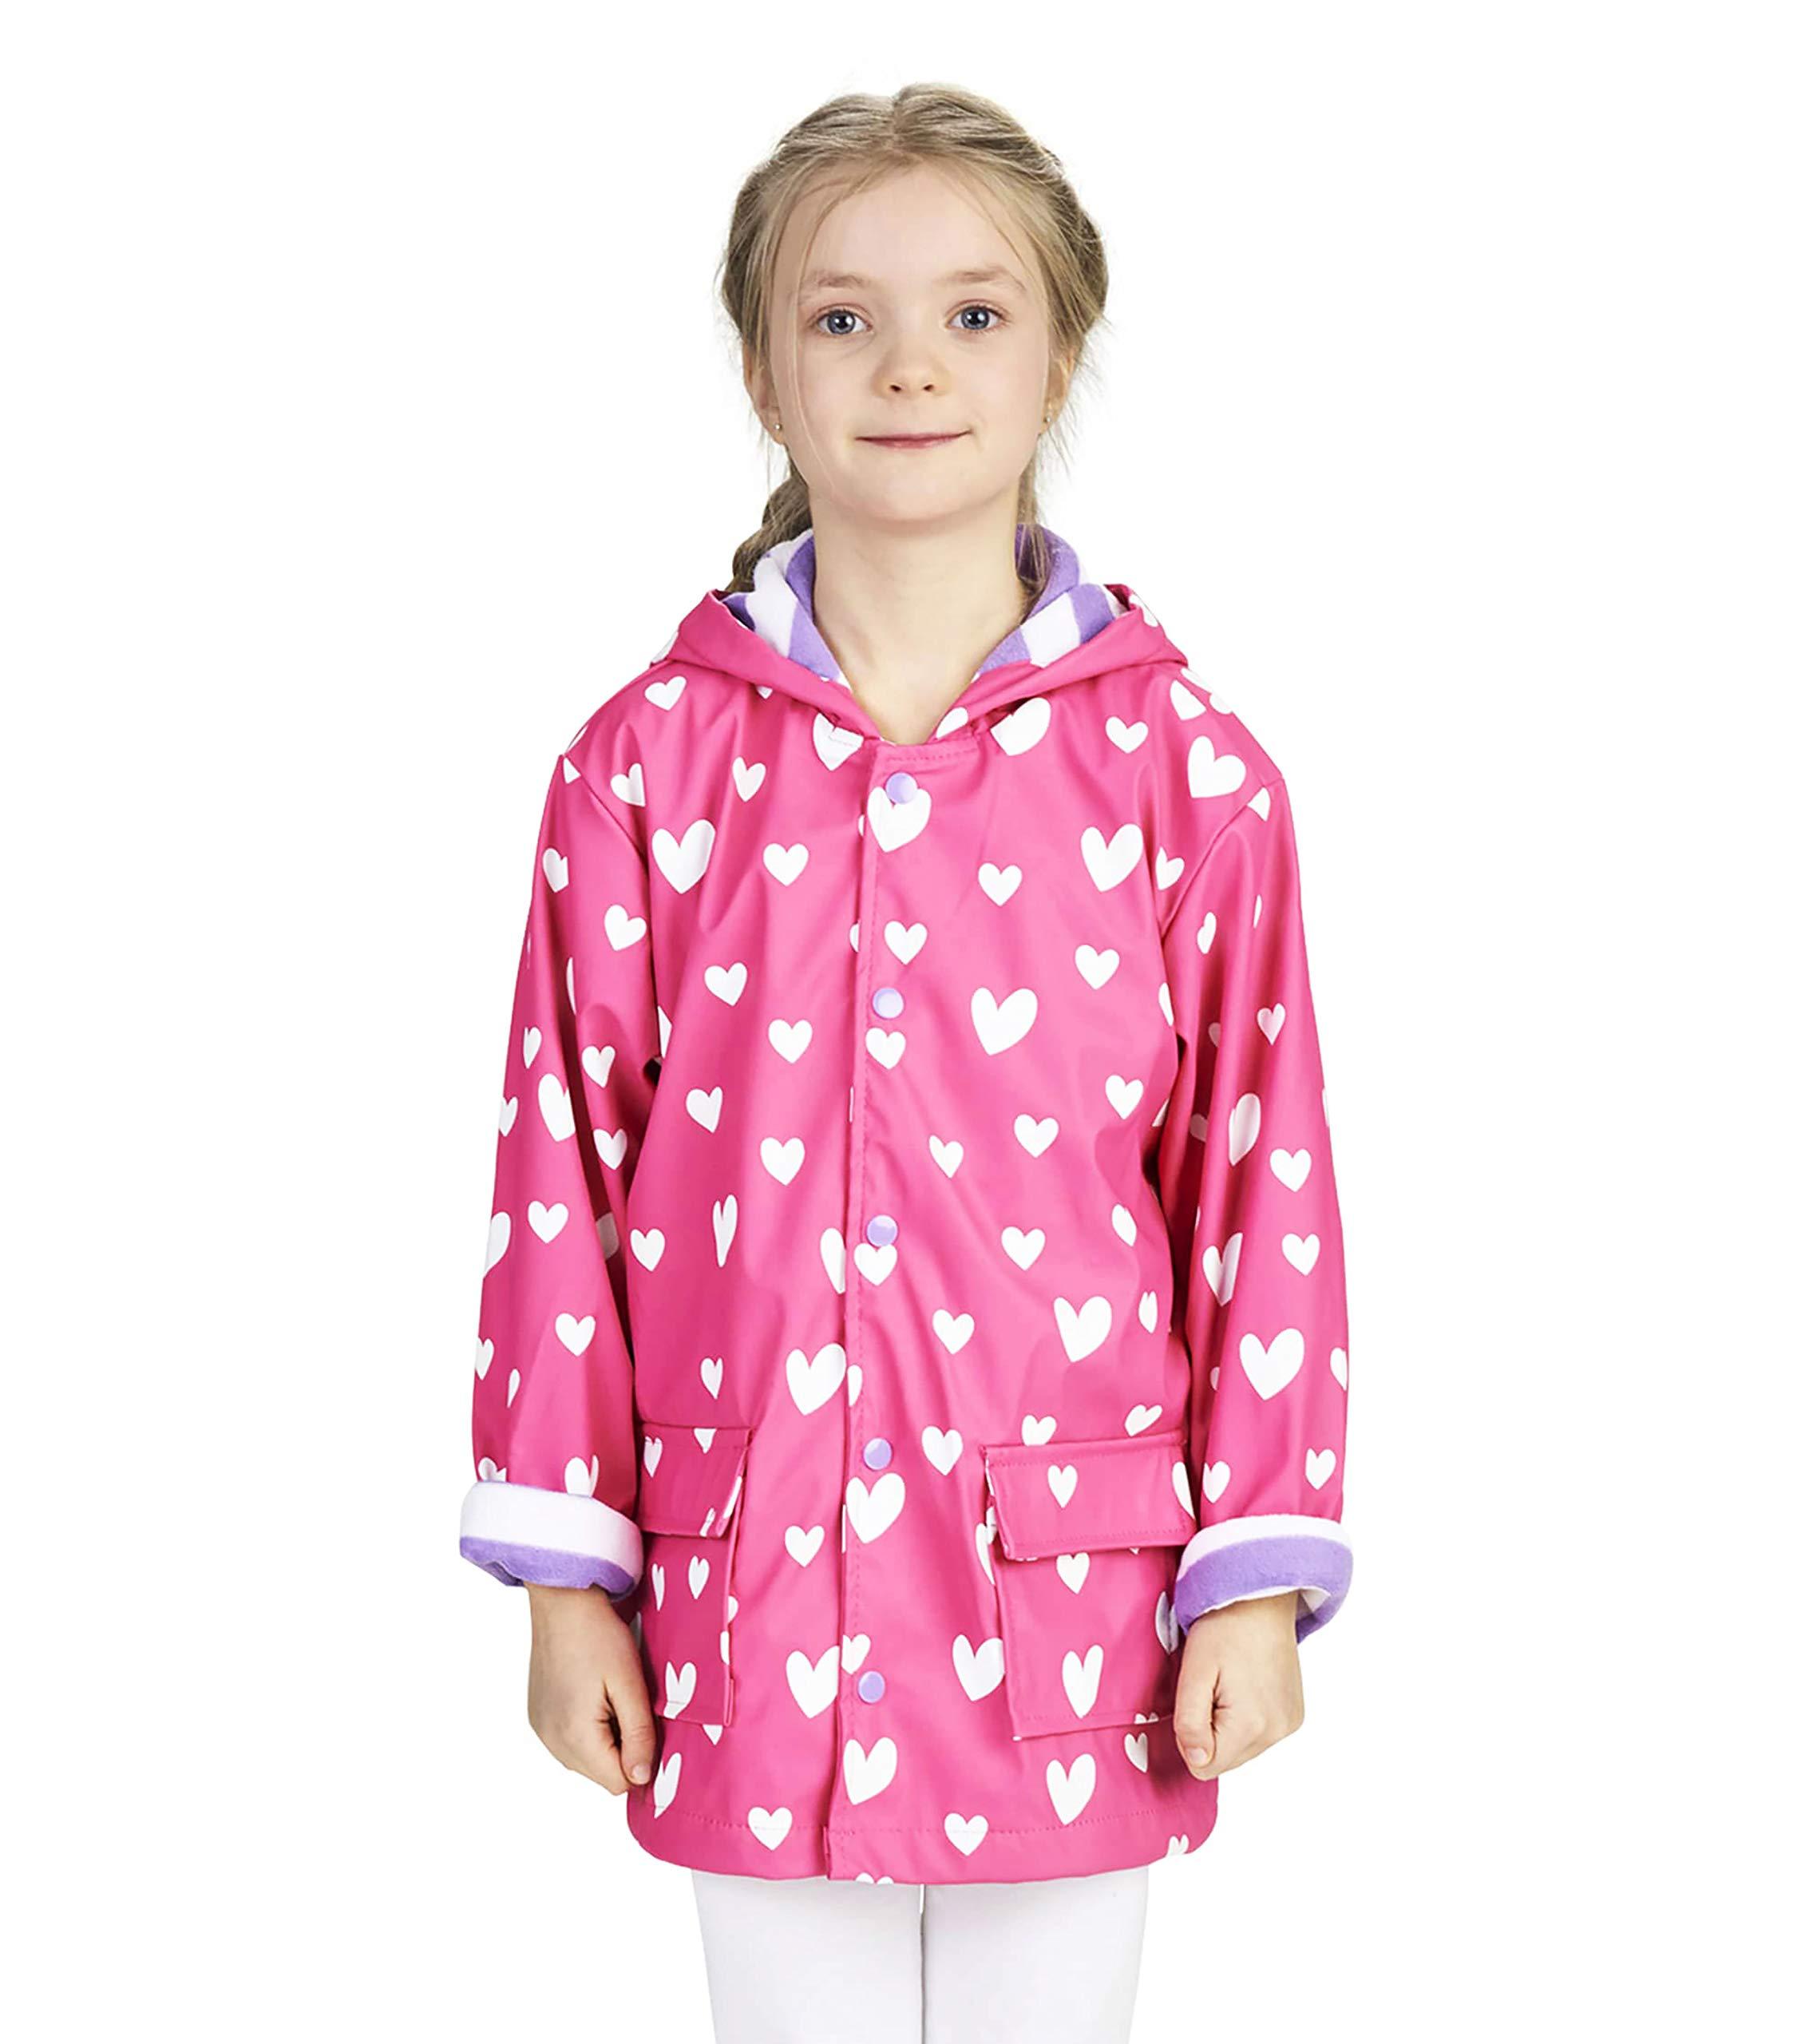 Hatley Girls' Little Printed Raincoats, Color Changing Sweethearts 2